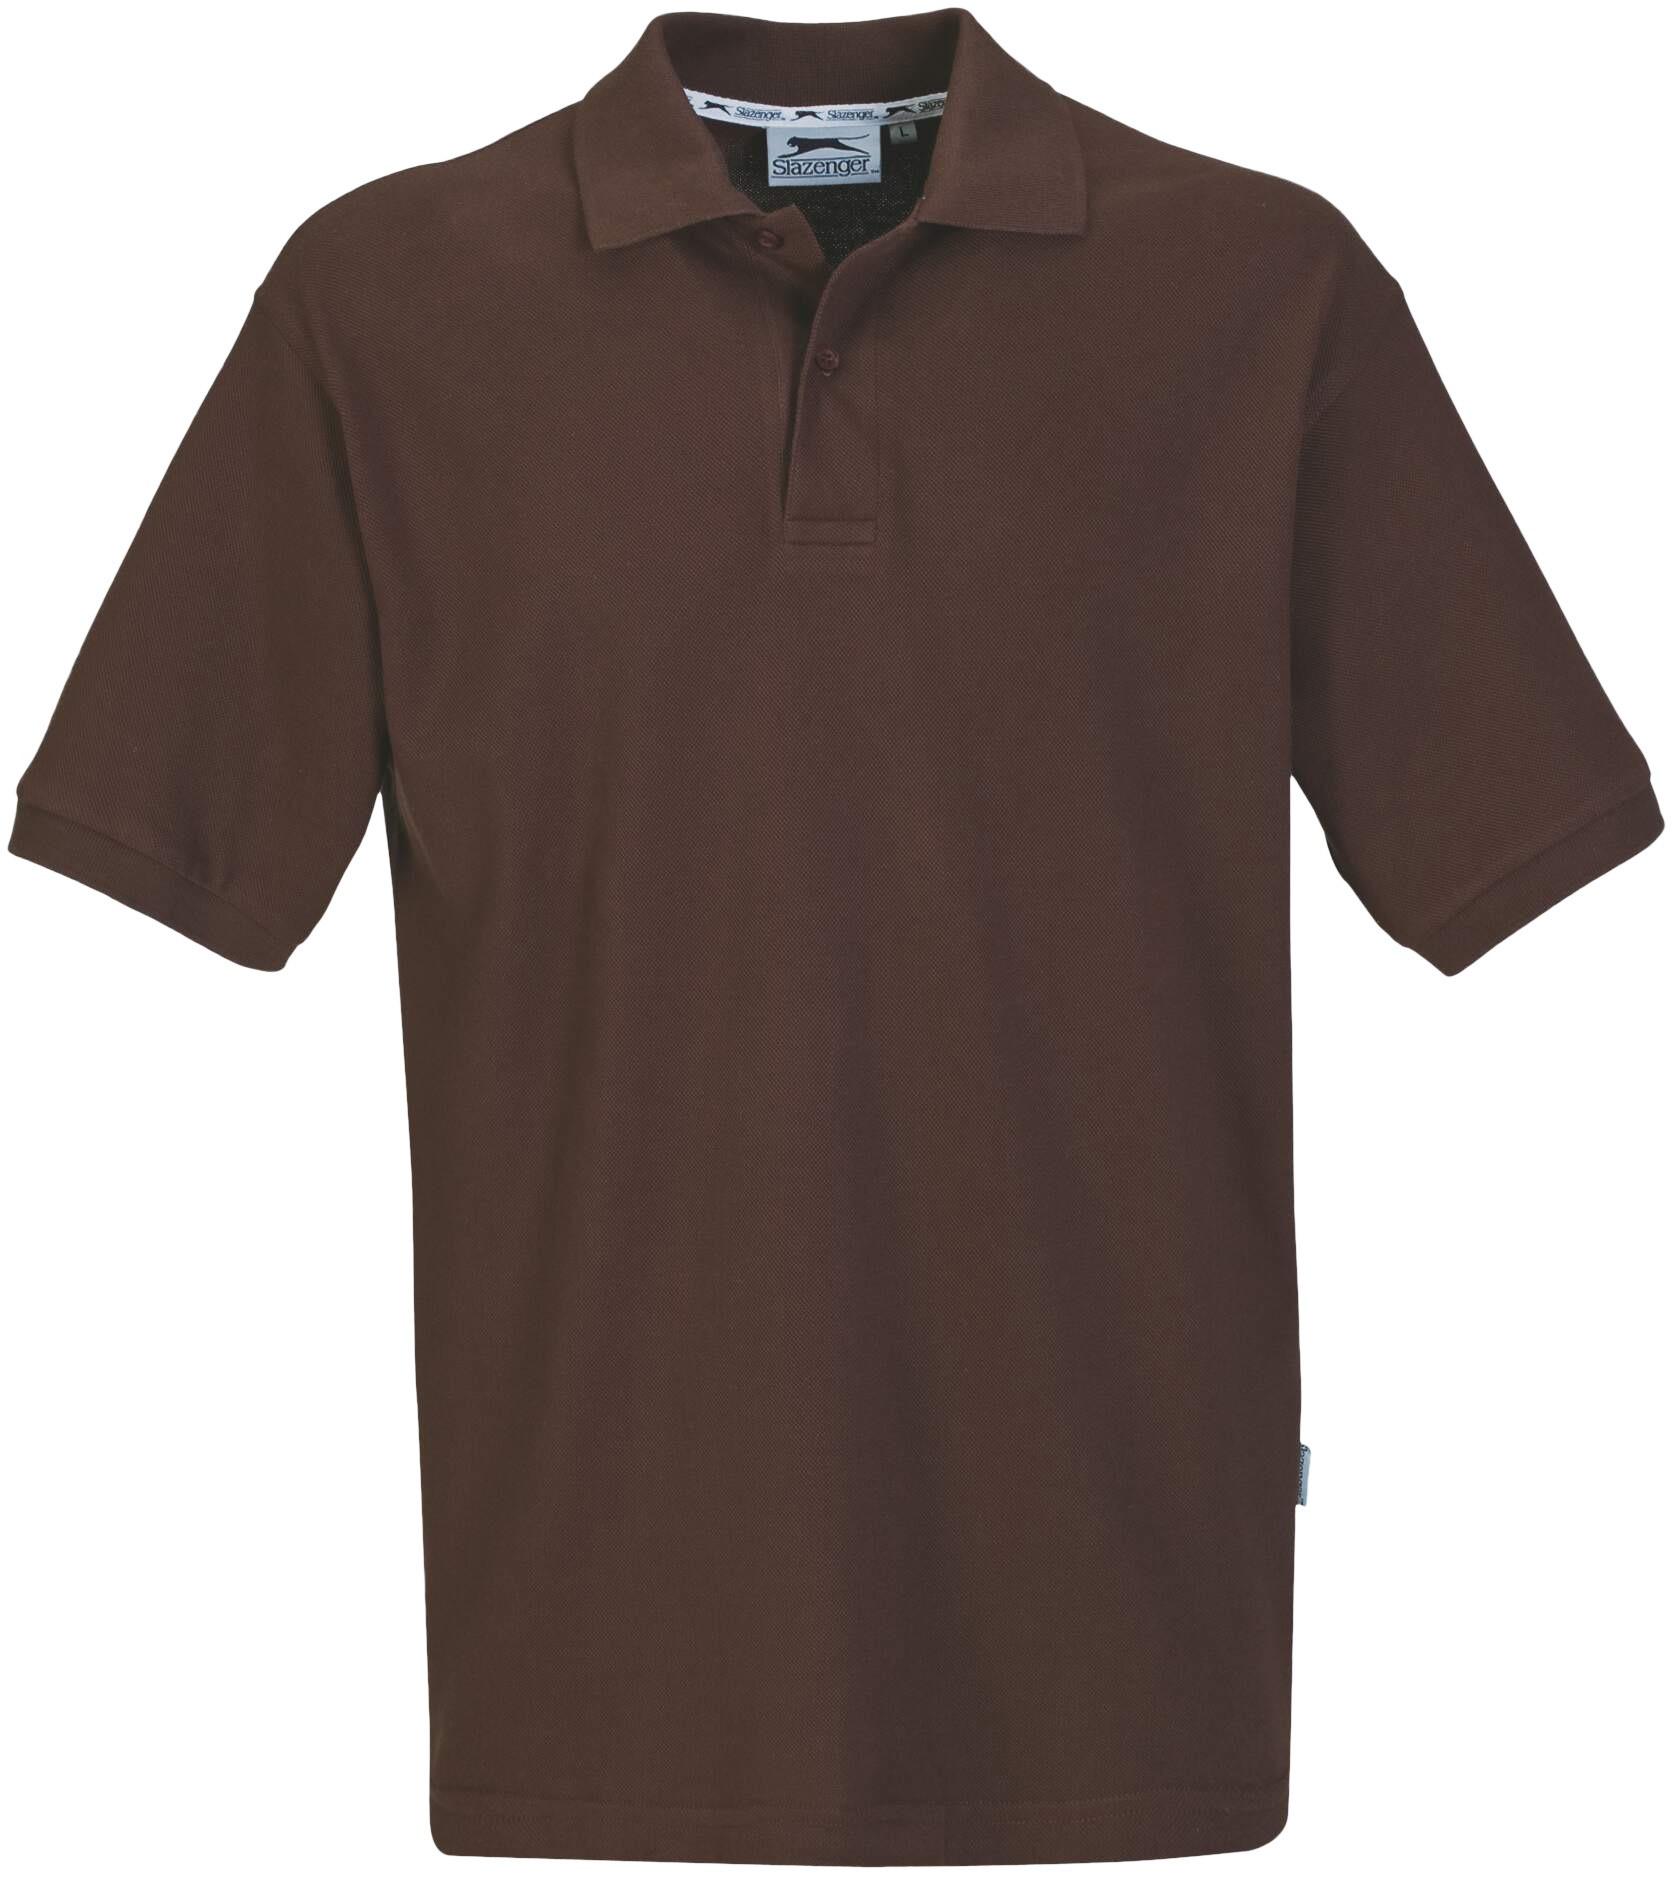 Crest mens golf shirt brown only slaz 803 bn for Name brand golf shirts direct